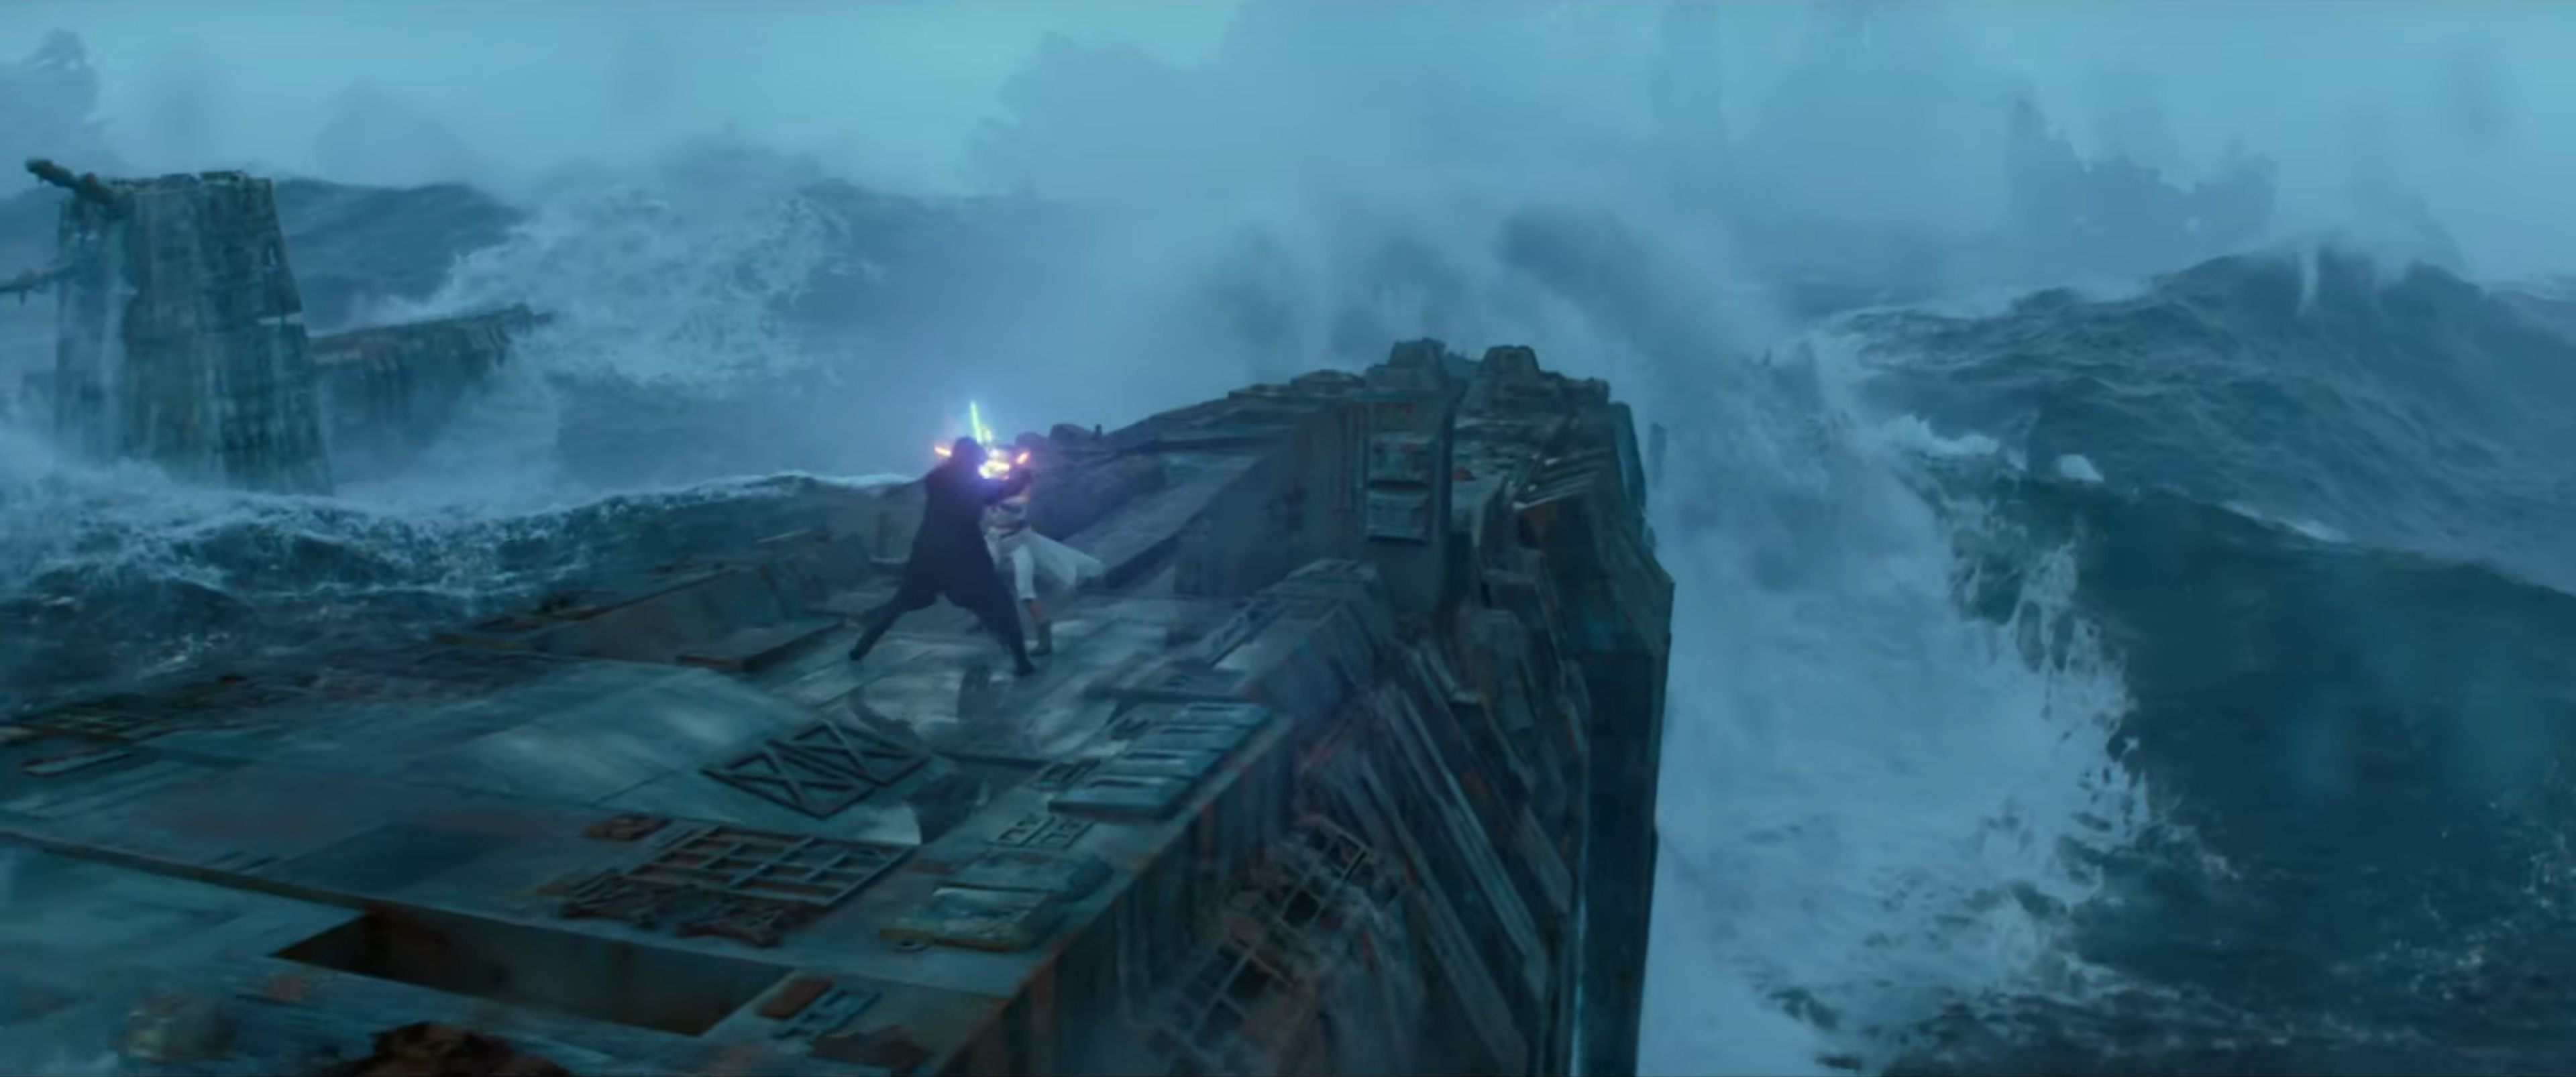 Star Wars Weekly Dark Rey Graces The New Trailer And Threepio Says Goodbye